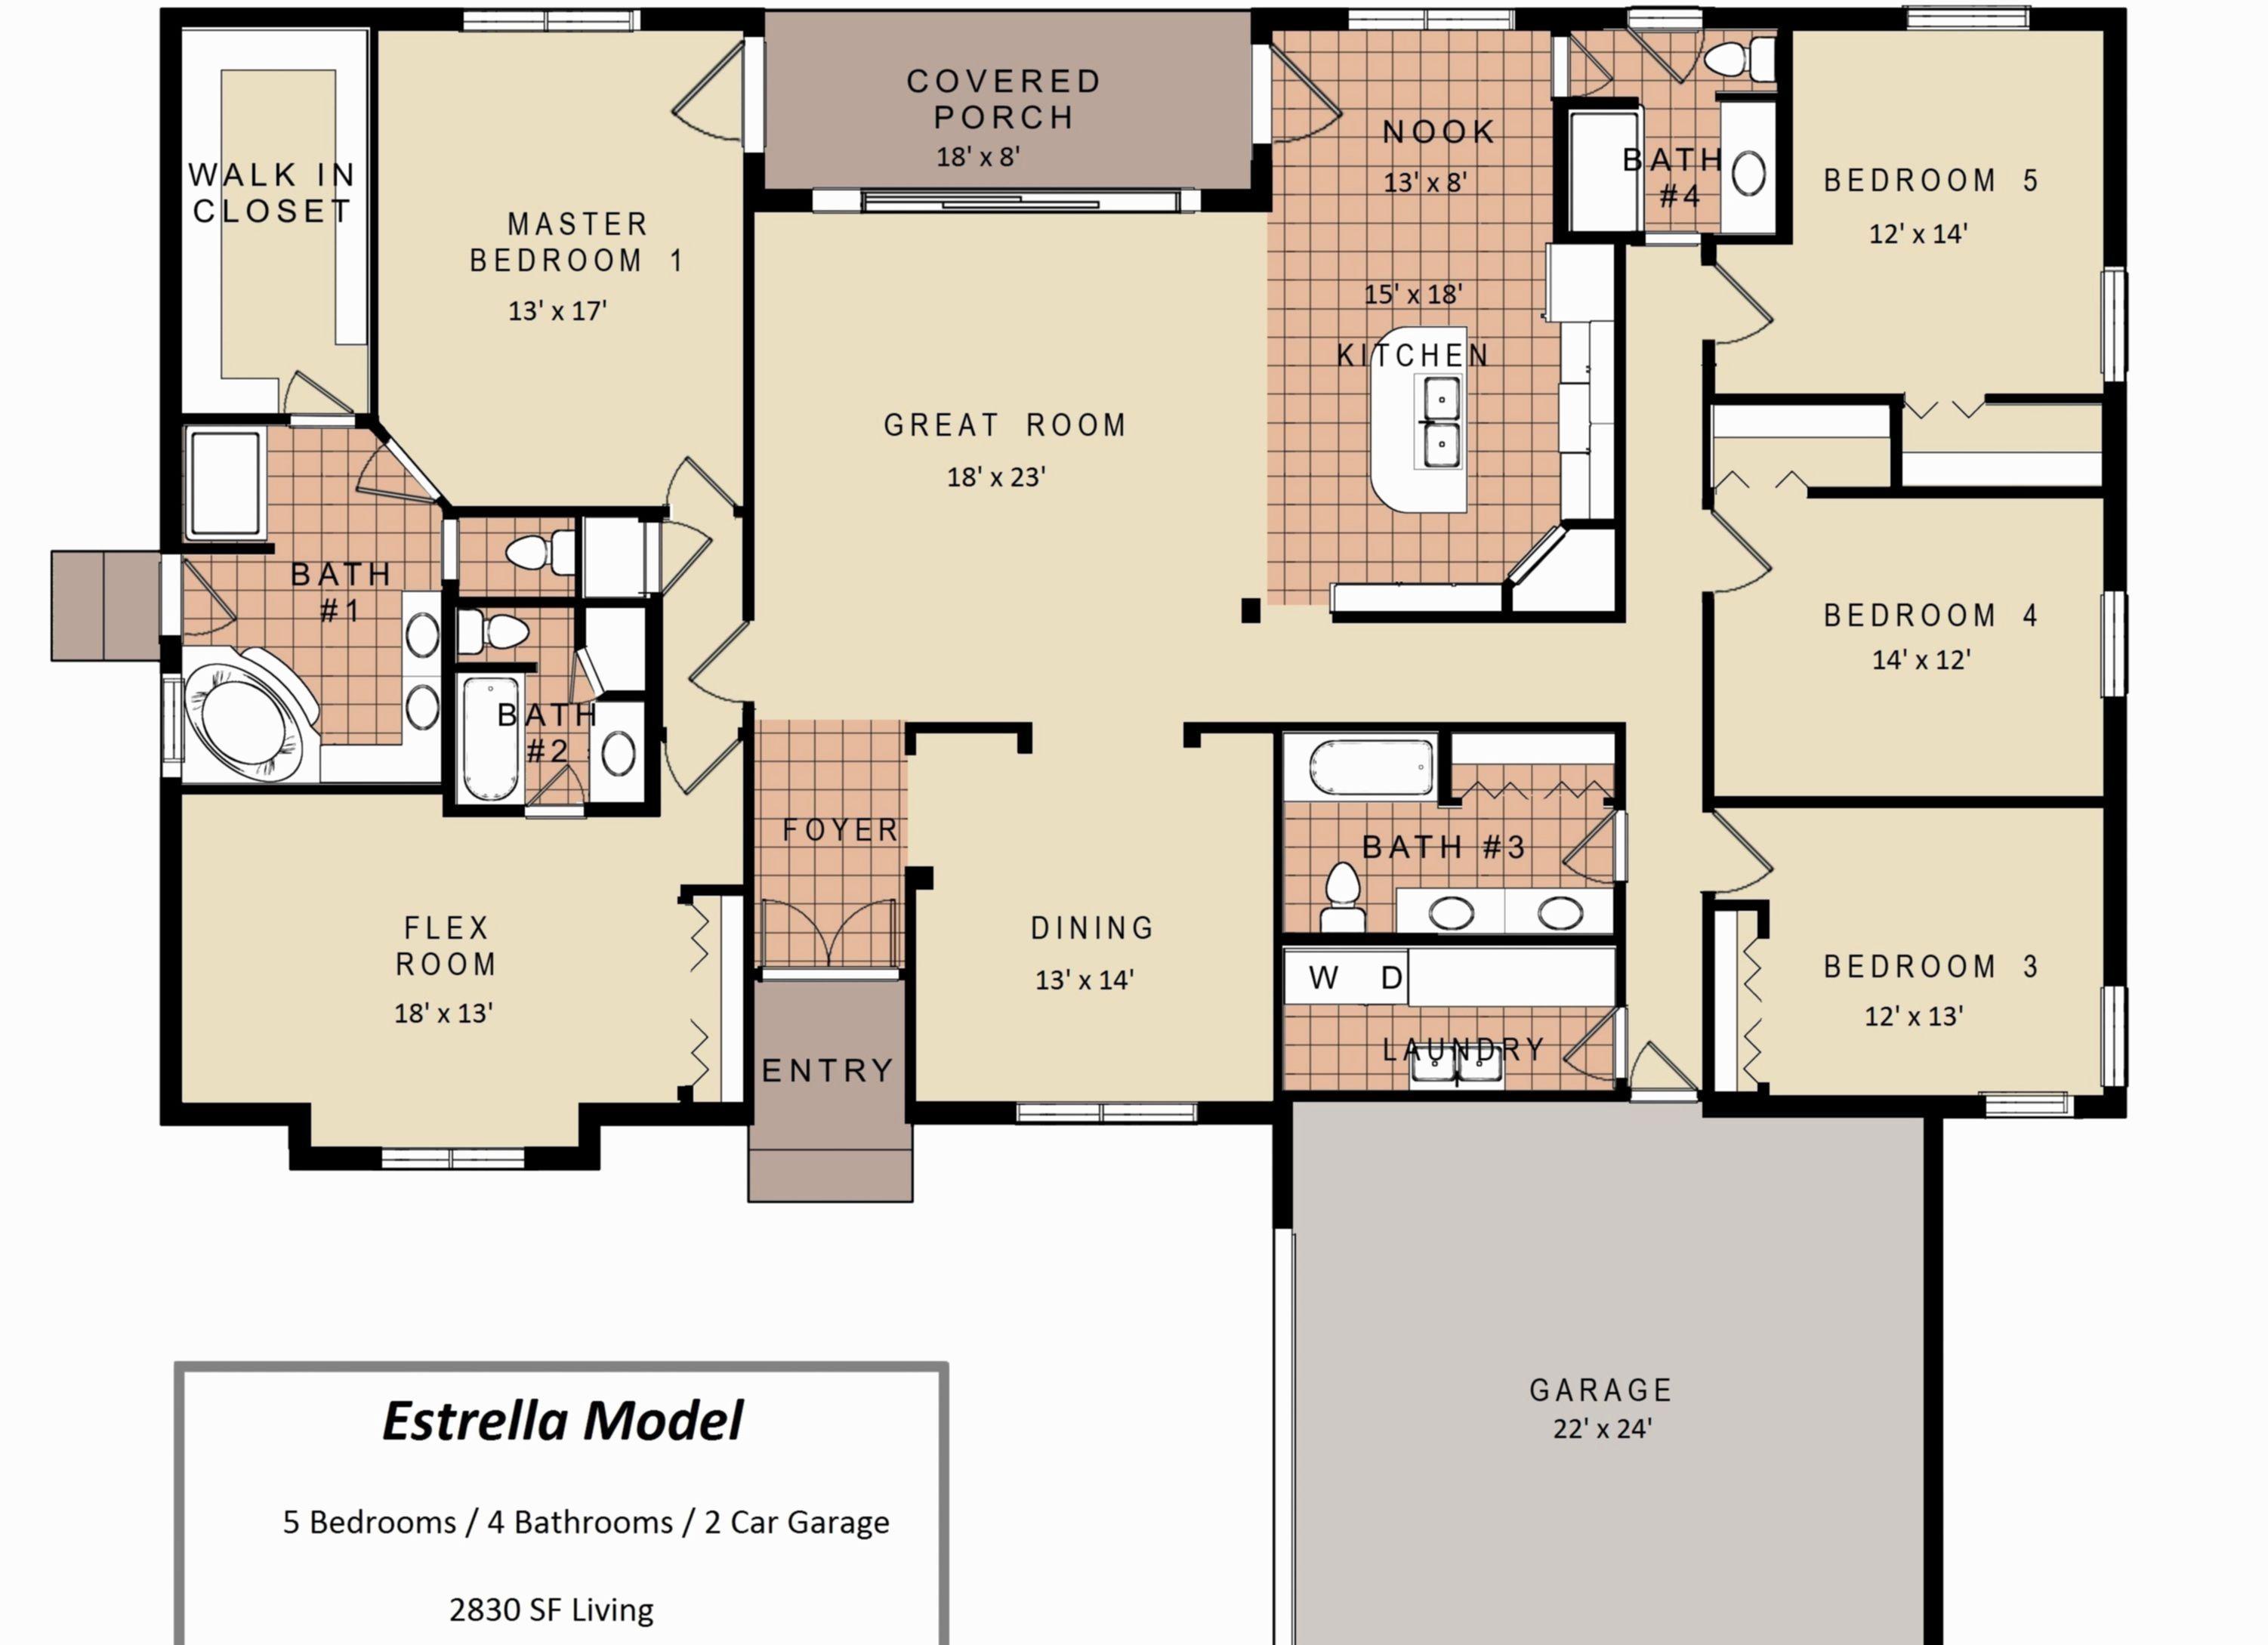 Inspiring Best 3 Bedroom Floor Plan Ideas With Best 25 Pictures Https Hroomy Com Building Archite 5 Bedroom House Plans Bedroom Floor Plans Ranch House Plans